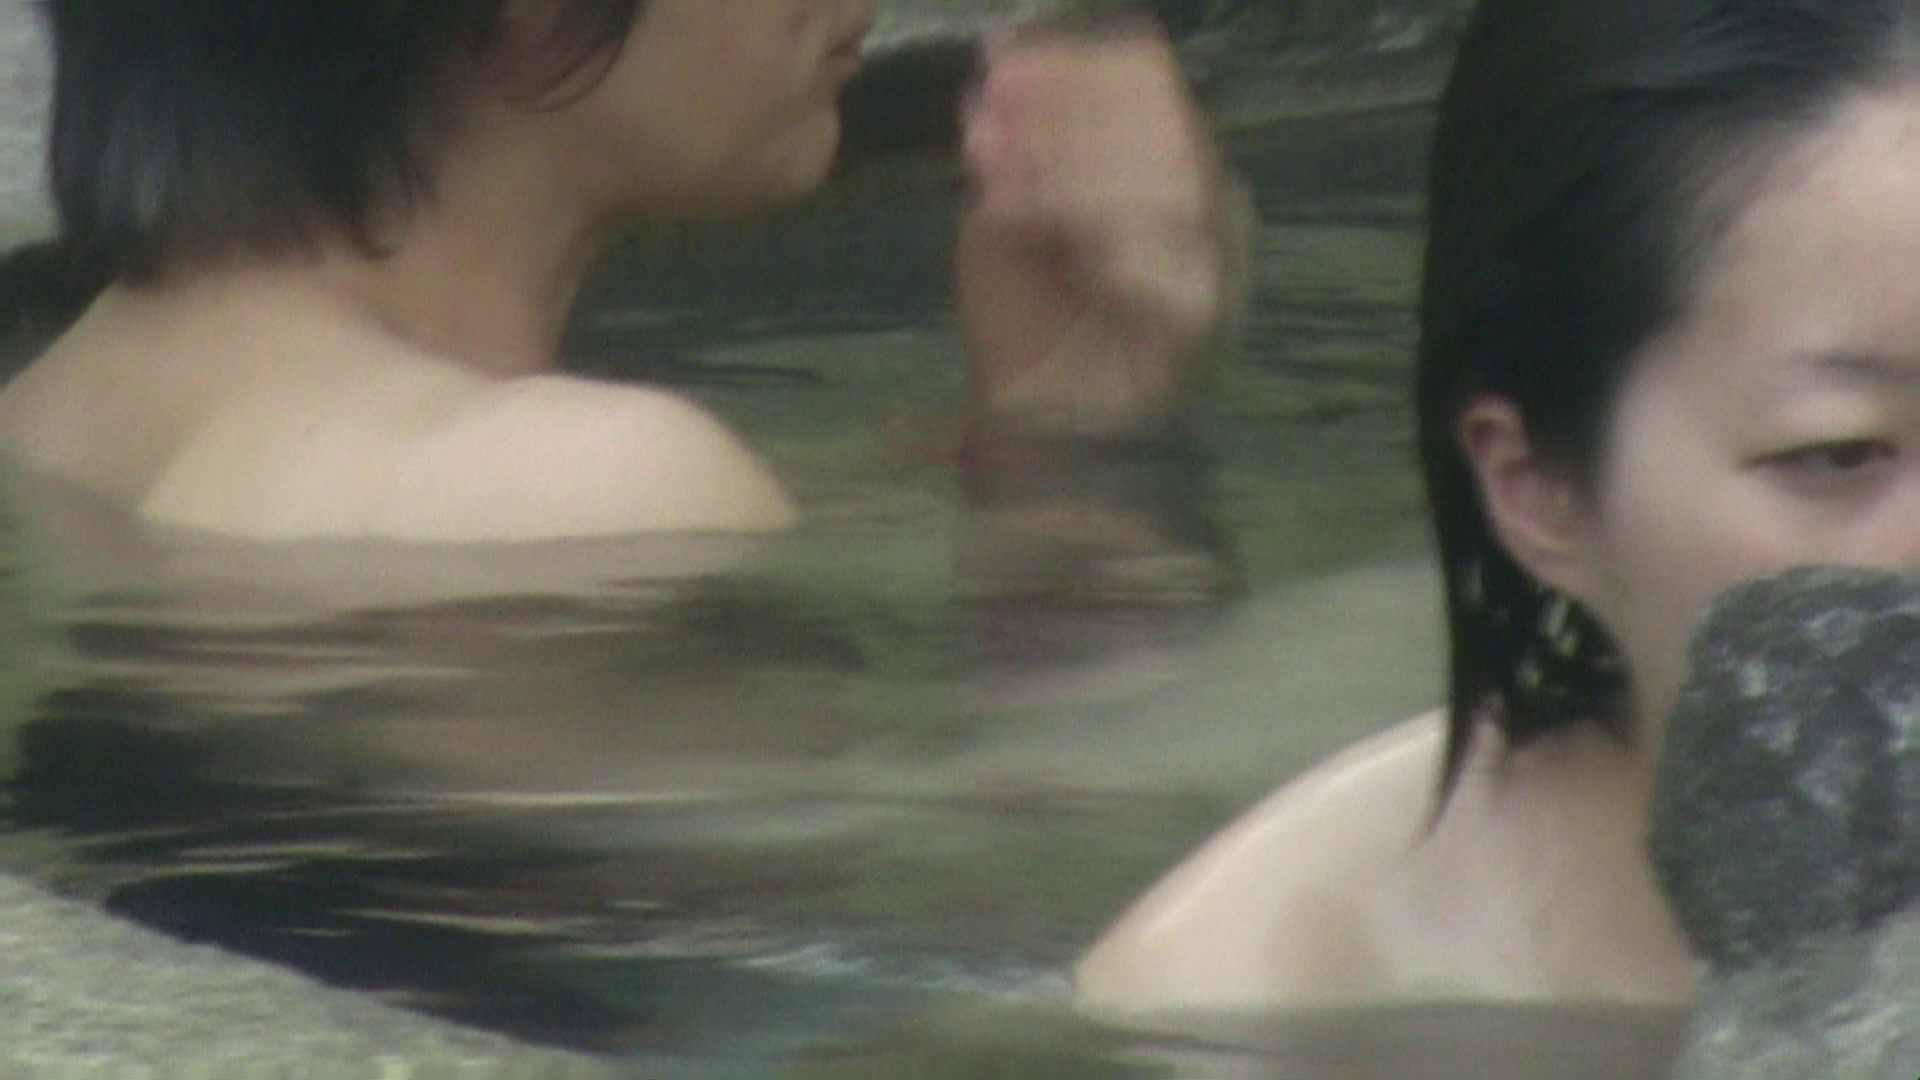 Aquaな露天風呂Vol.06【VIP】 露天 オマンコ無修正動画無料 113PICs 41